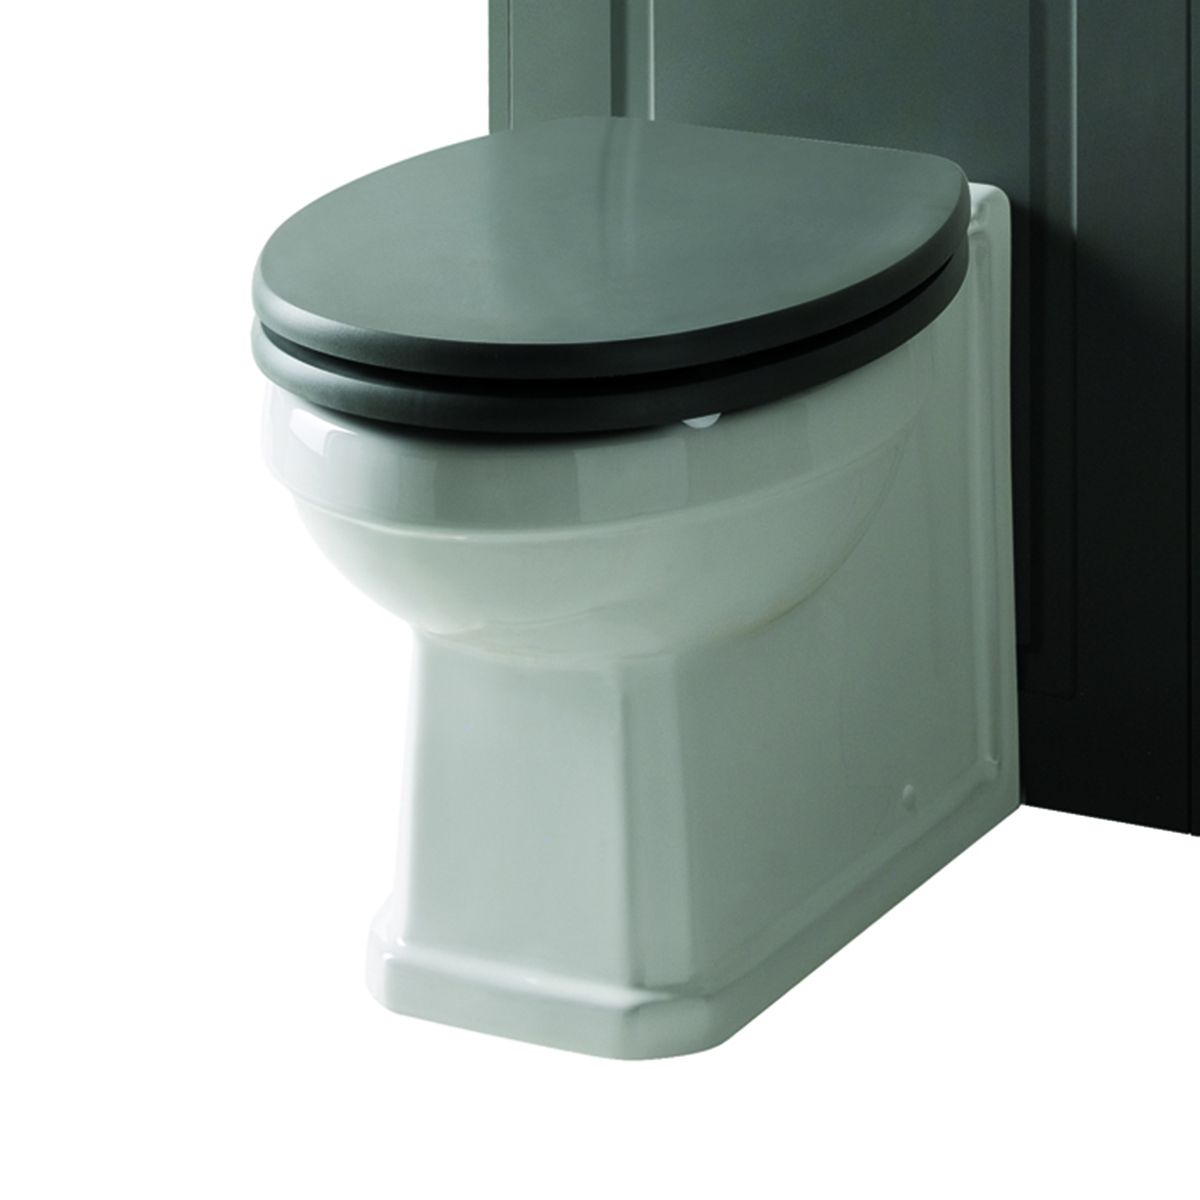 Kartell Astley Matt Grey Soft Close Toilet Seat